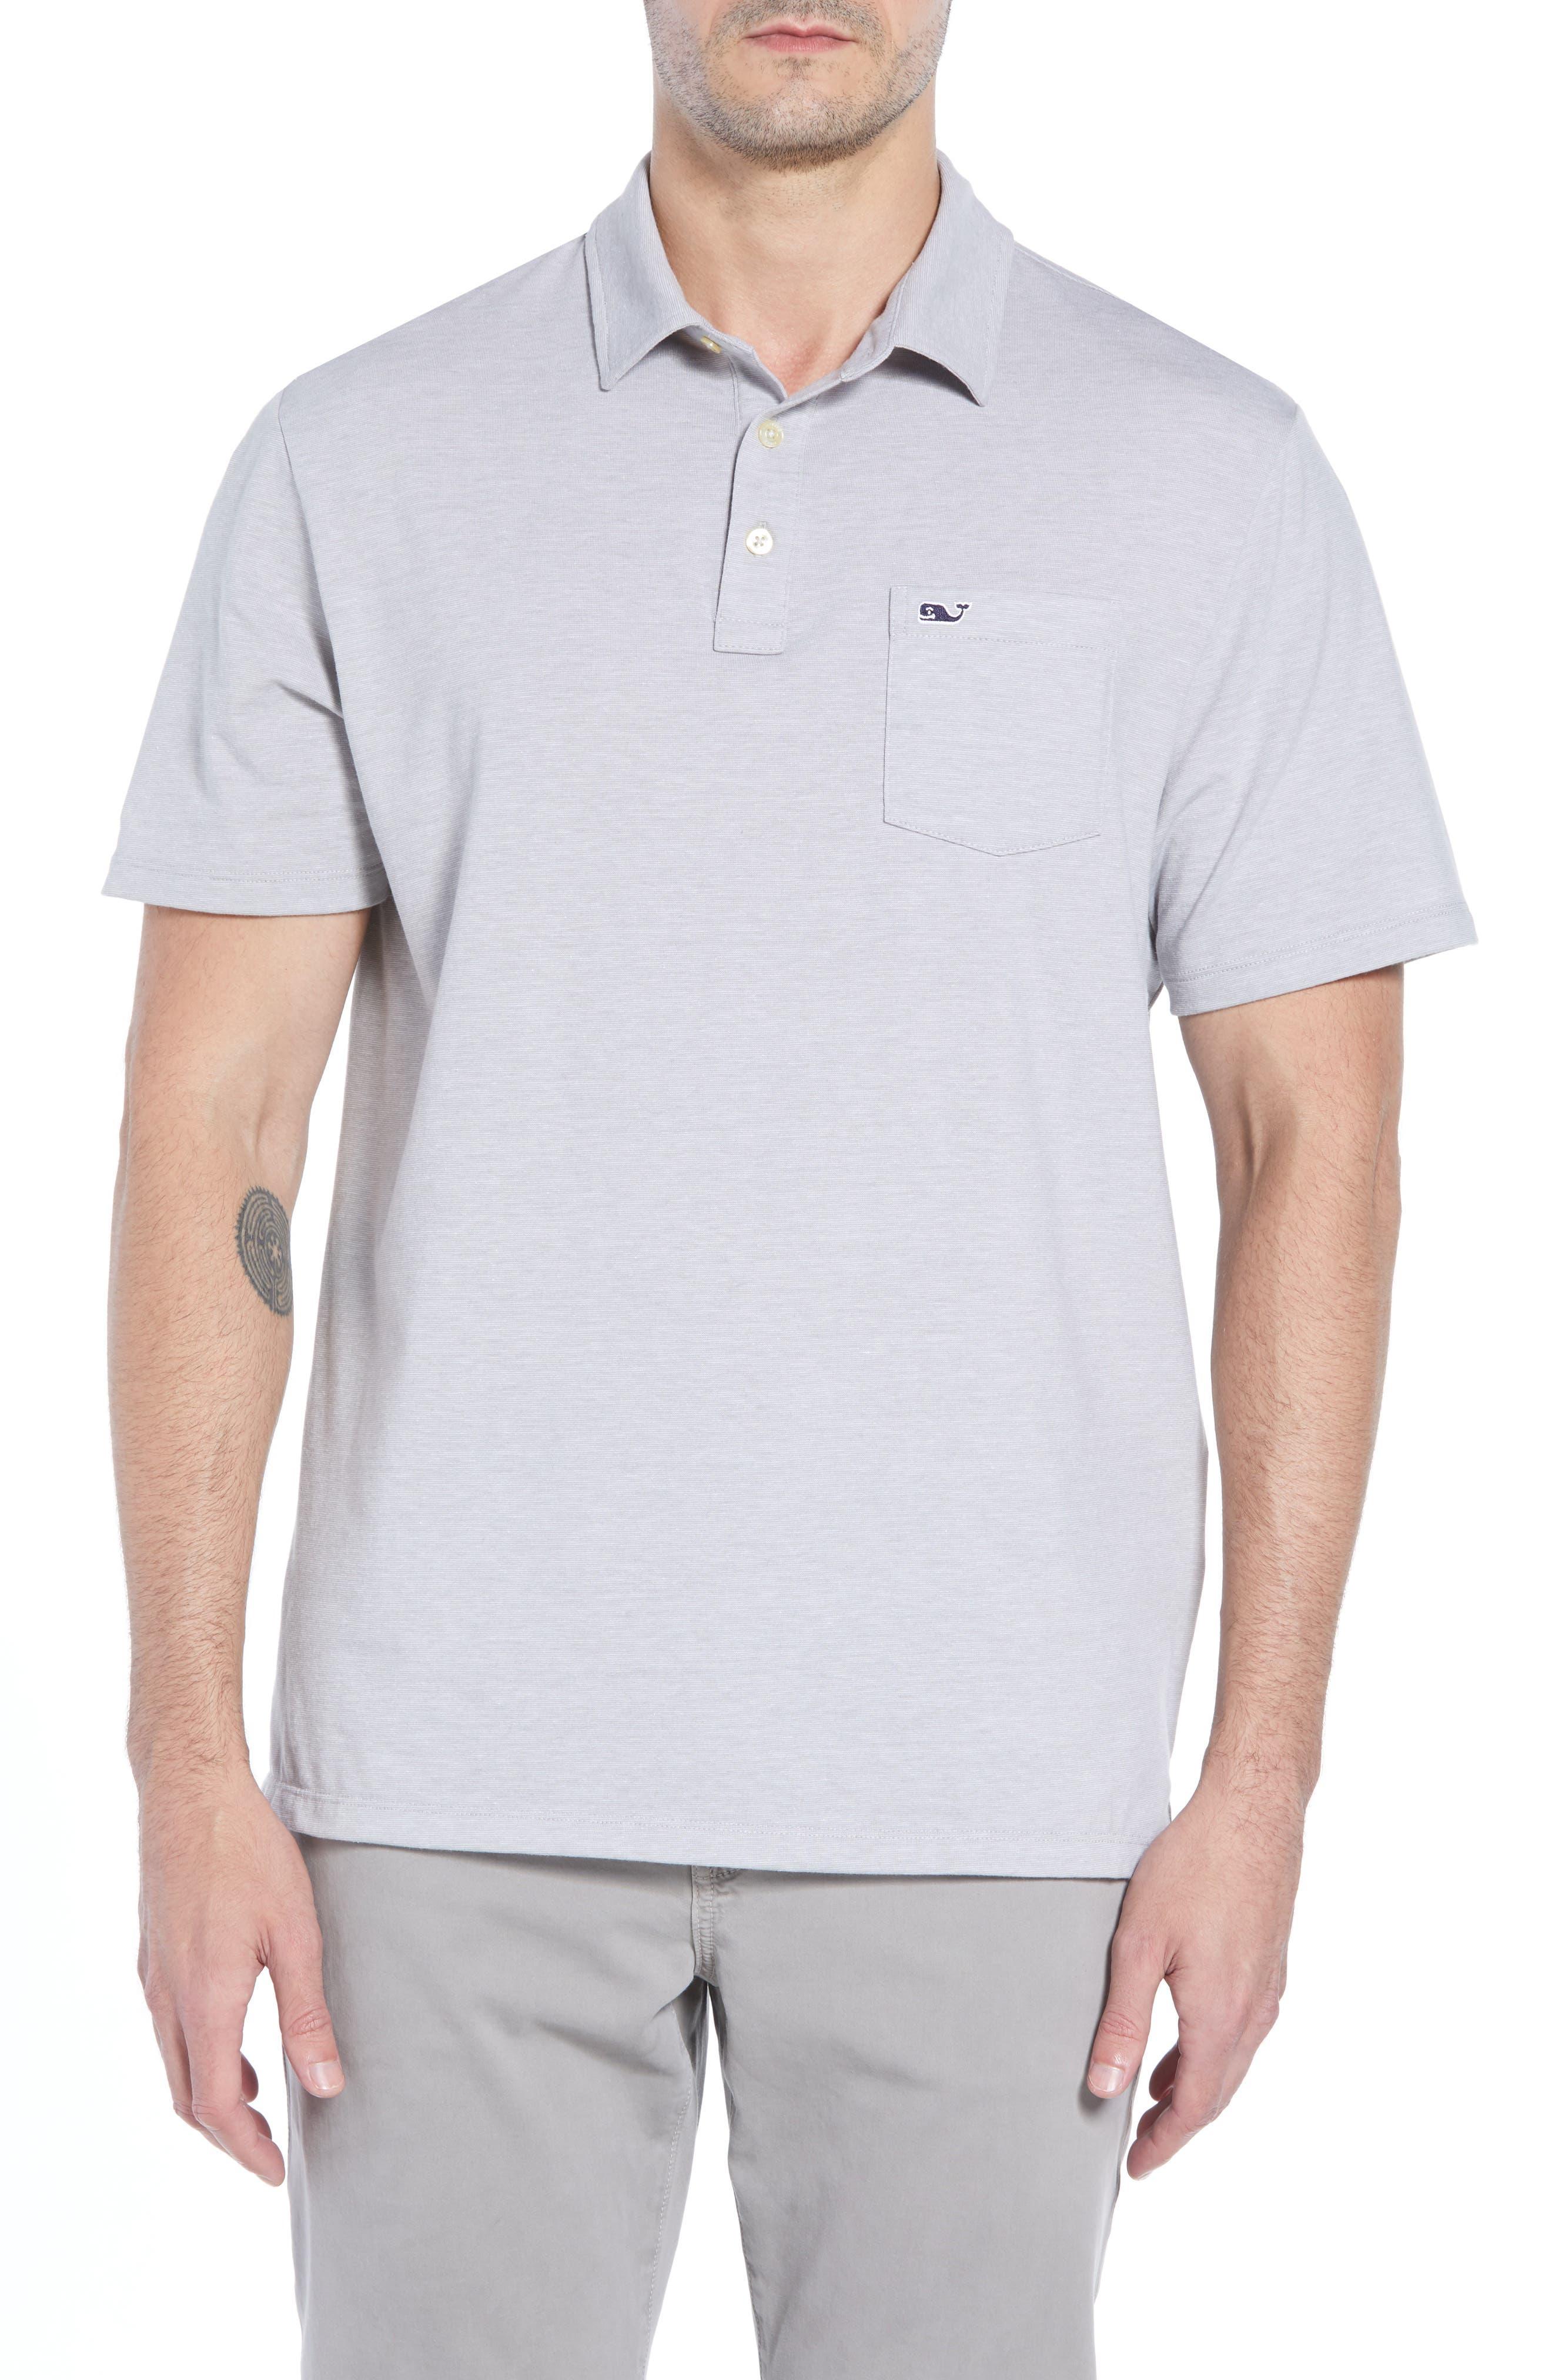 Edgartown Polo Shirt,                         Main,                         color, MONUMENT GRAY